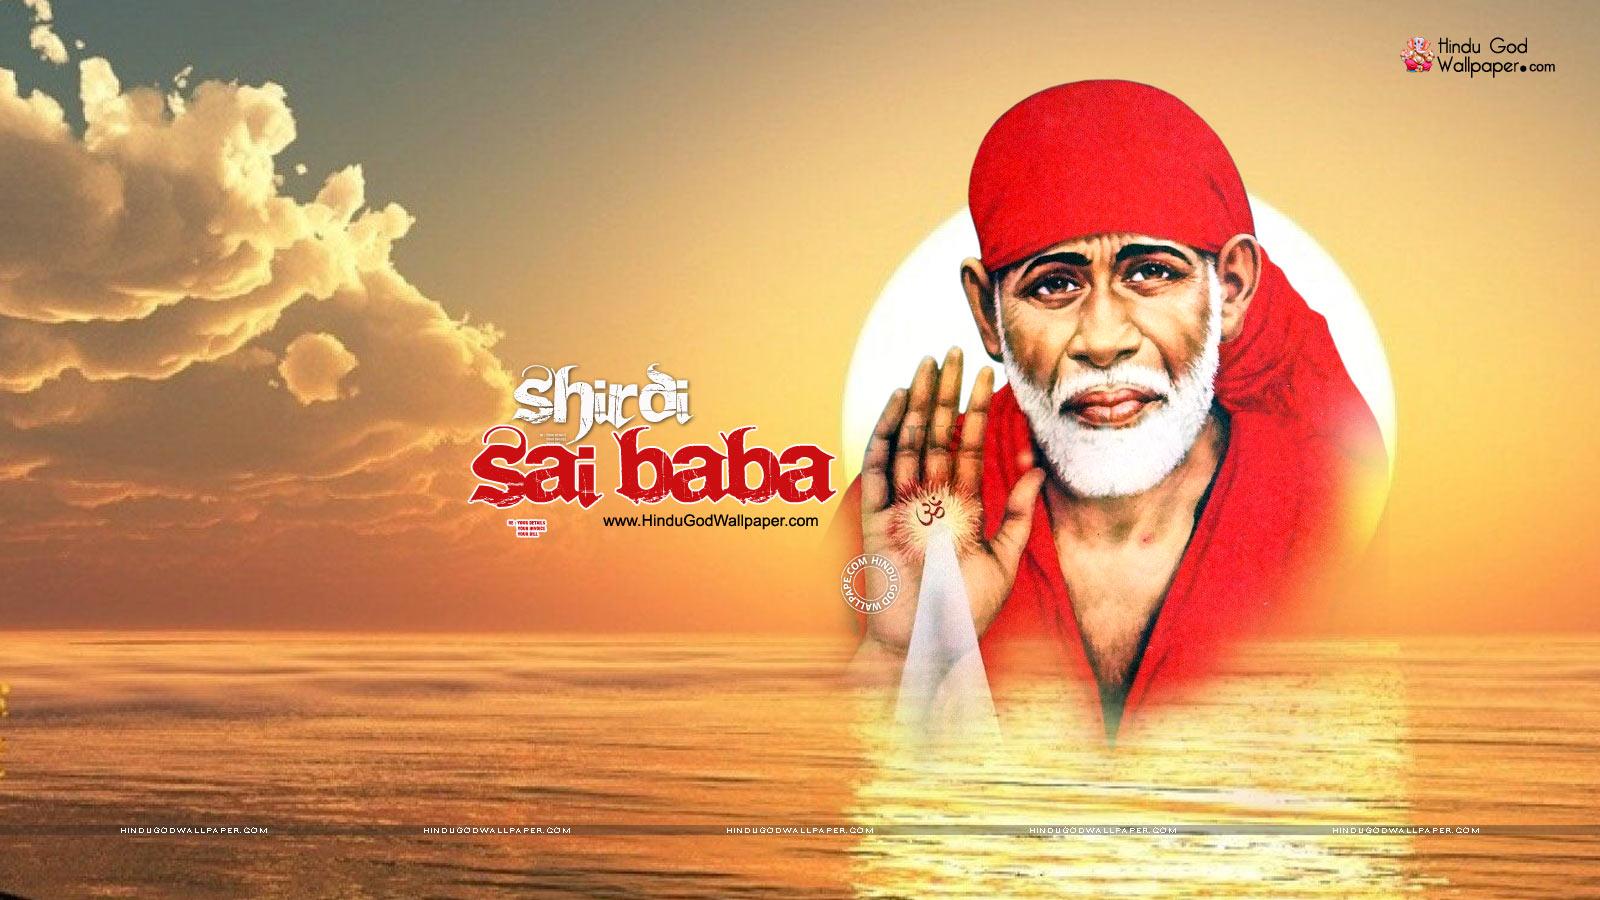 Free Download Sai Baba Hd 1080p Wallpapers For Desktop